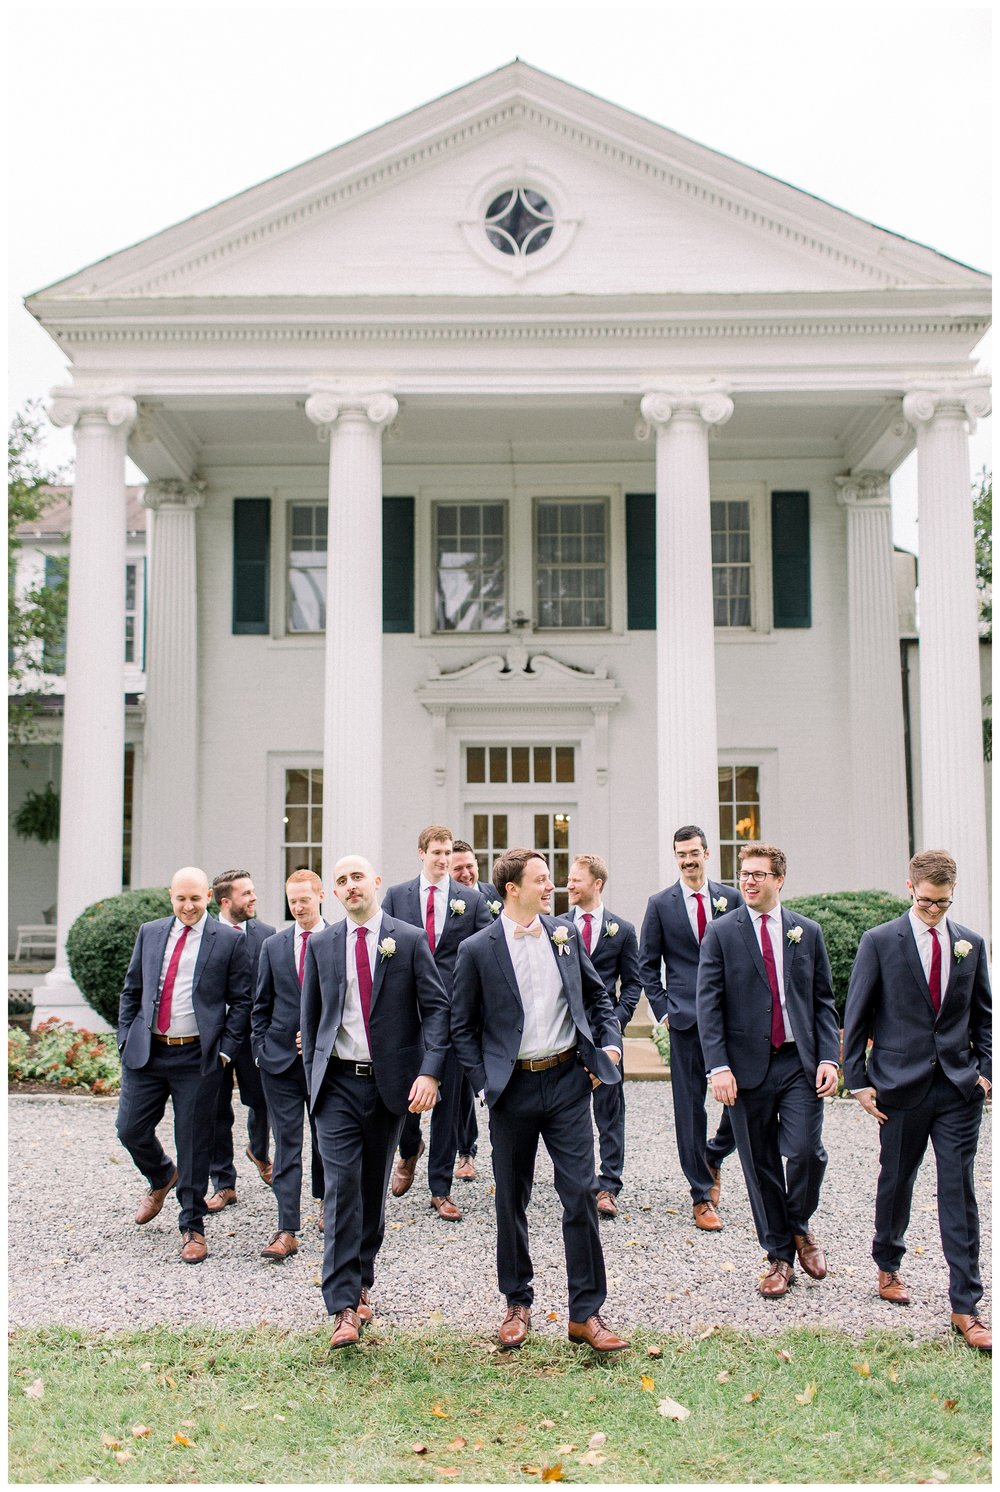 Whitehall Estate Wedding | Northern Virginia Wedding Photographer Kir Tuben_0053.jpg